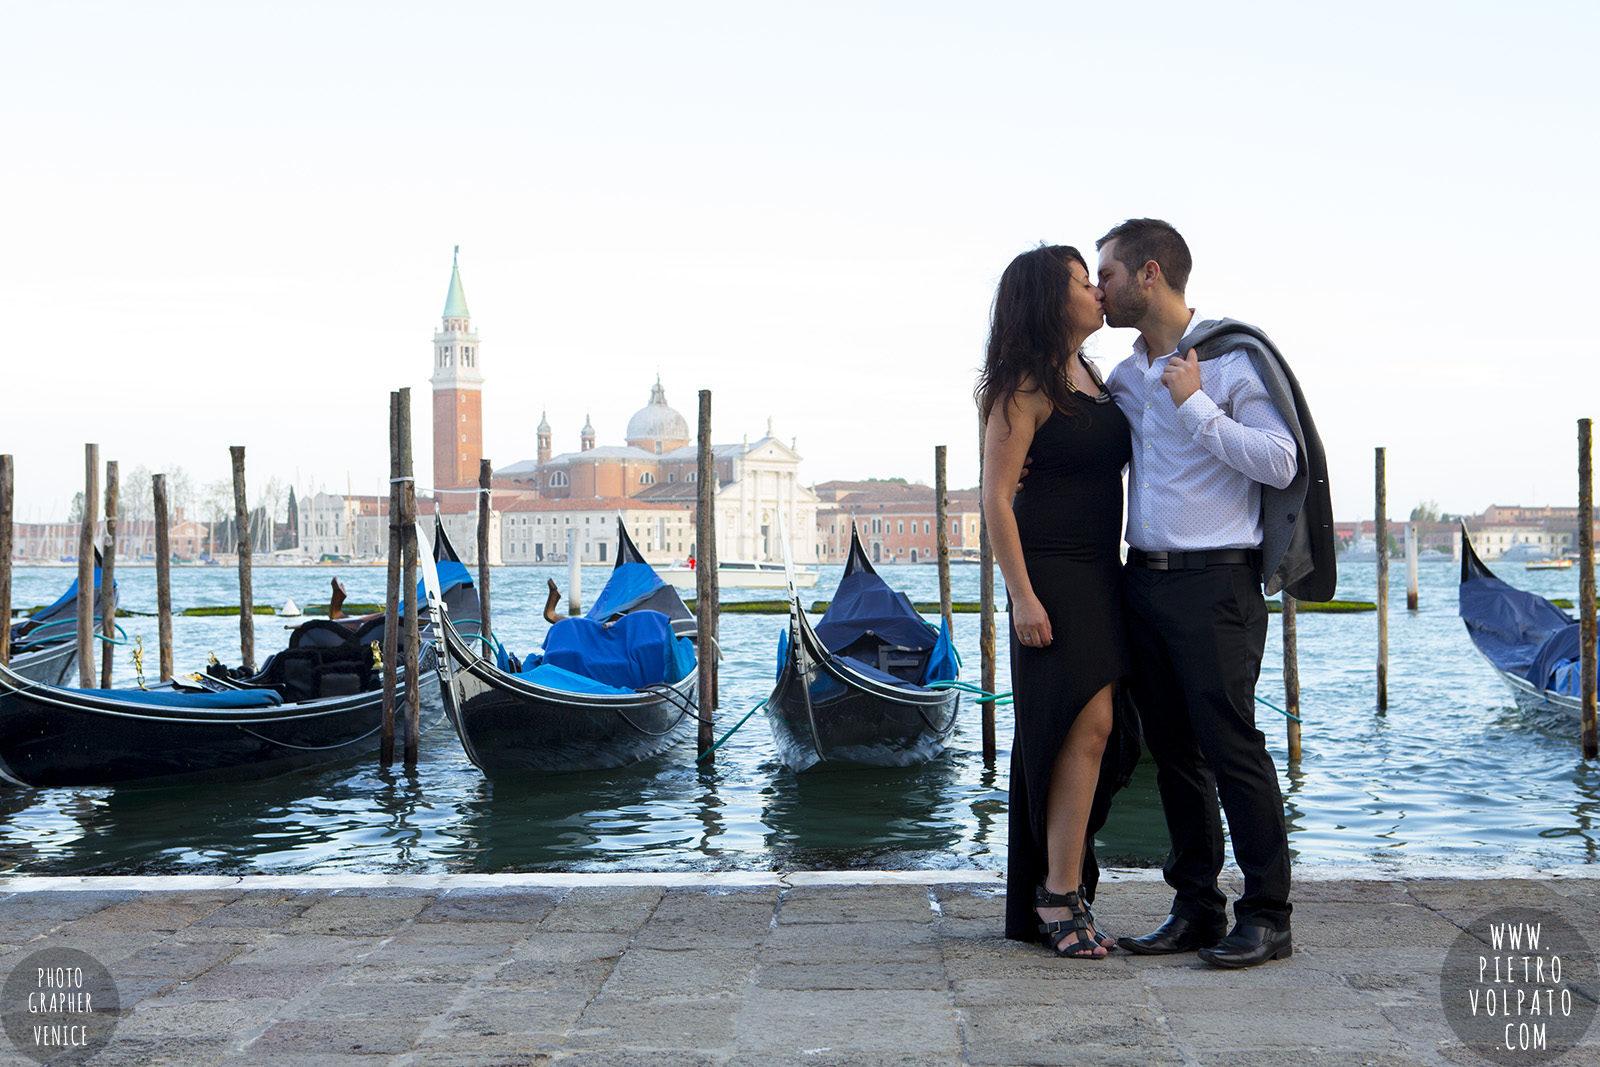 photographer-venice-photoshoot-couple-romantic-vacation-20160417_09